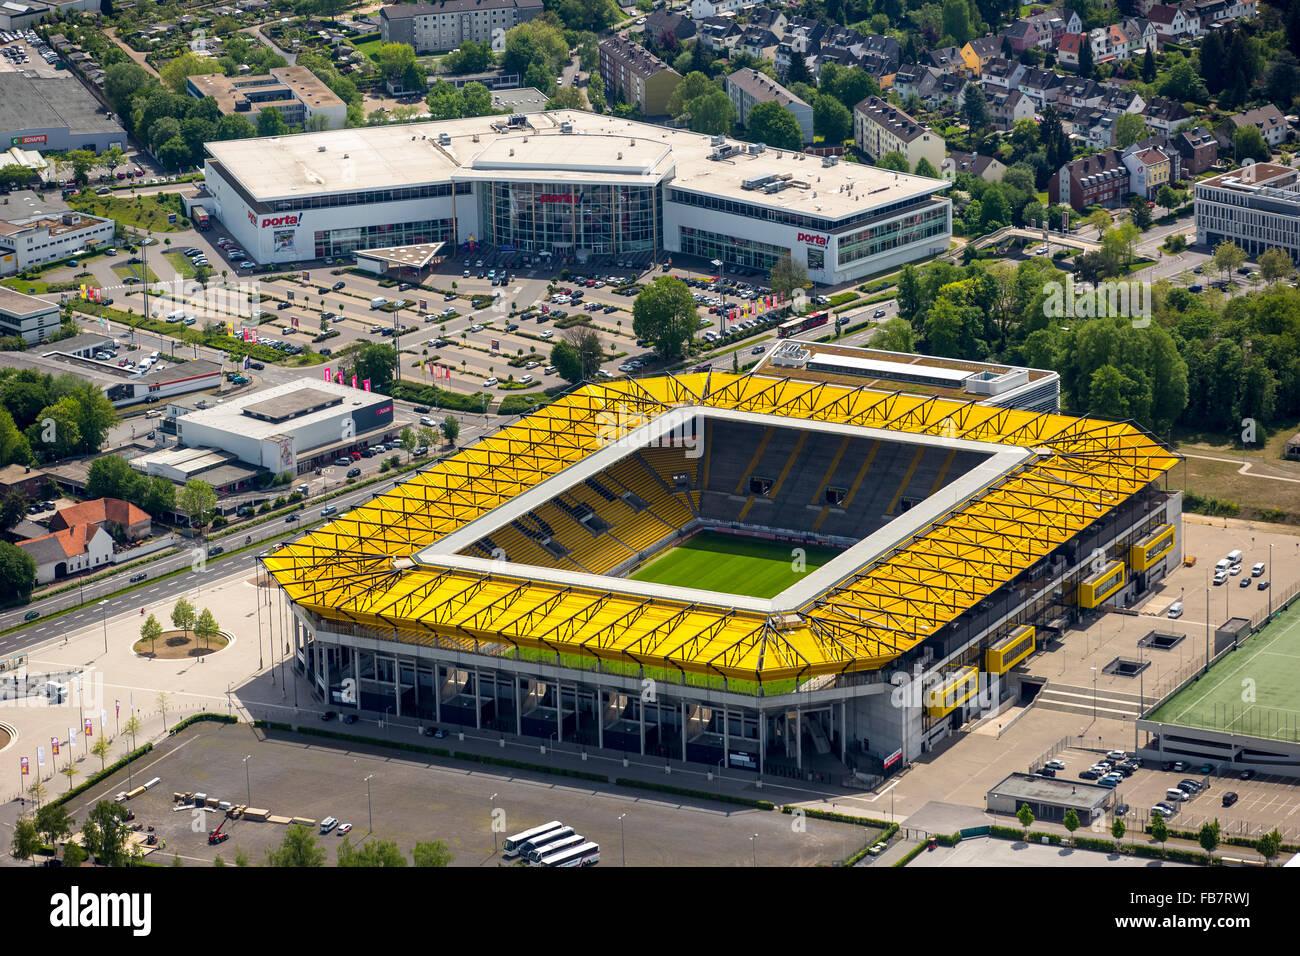 Aerial view, Bundesliga football Premiere League, Tivoli, football stadium of Alemannia Aachen, Aachen, Meuse-Rhine - Stock Image